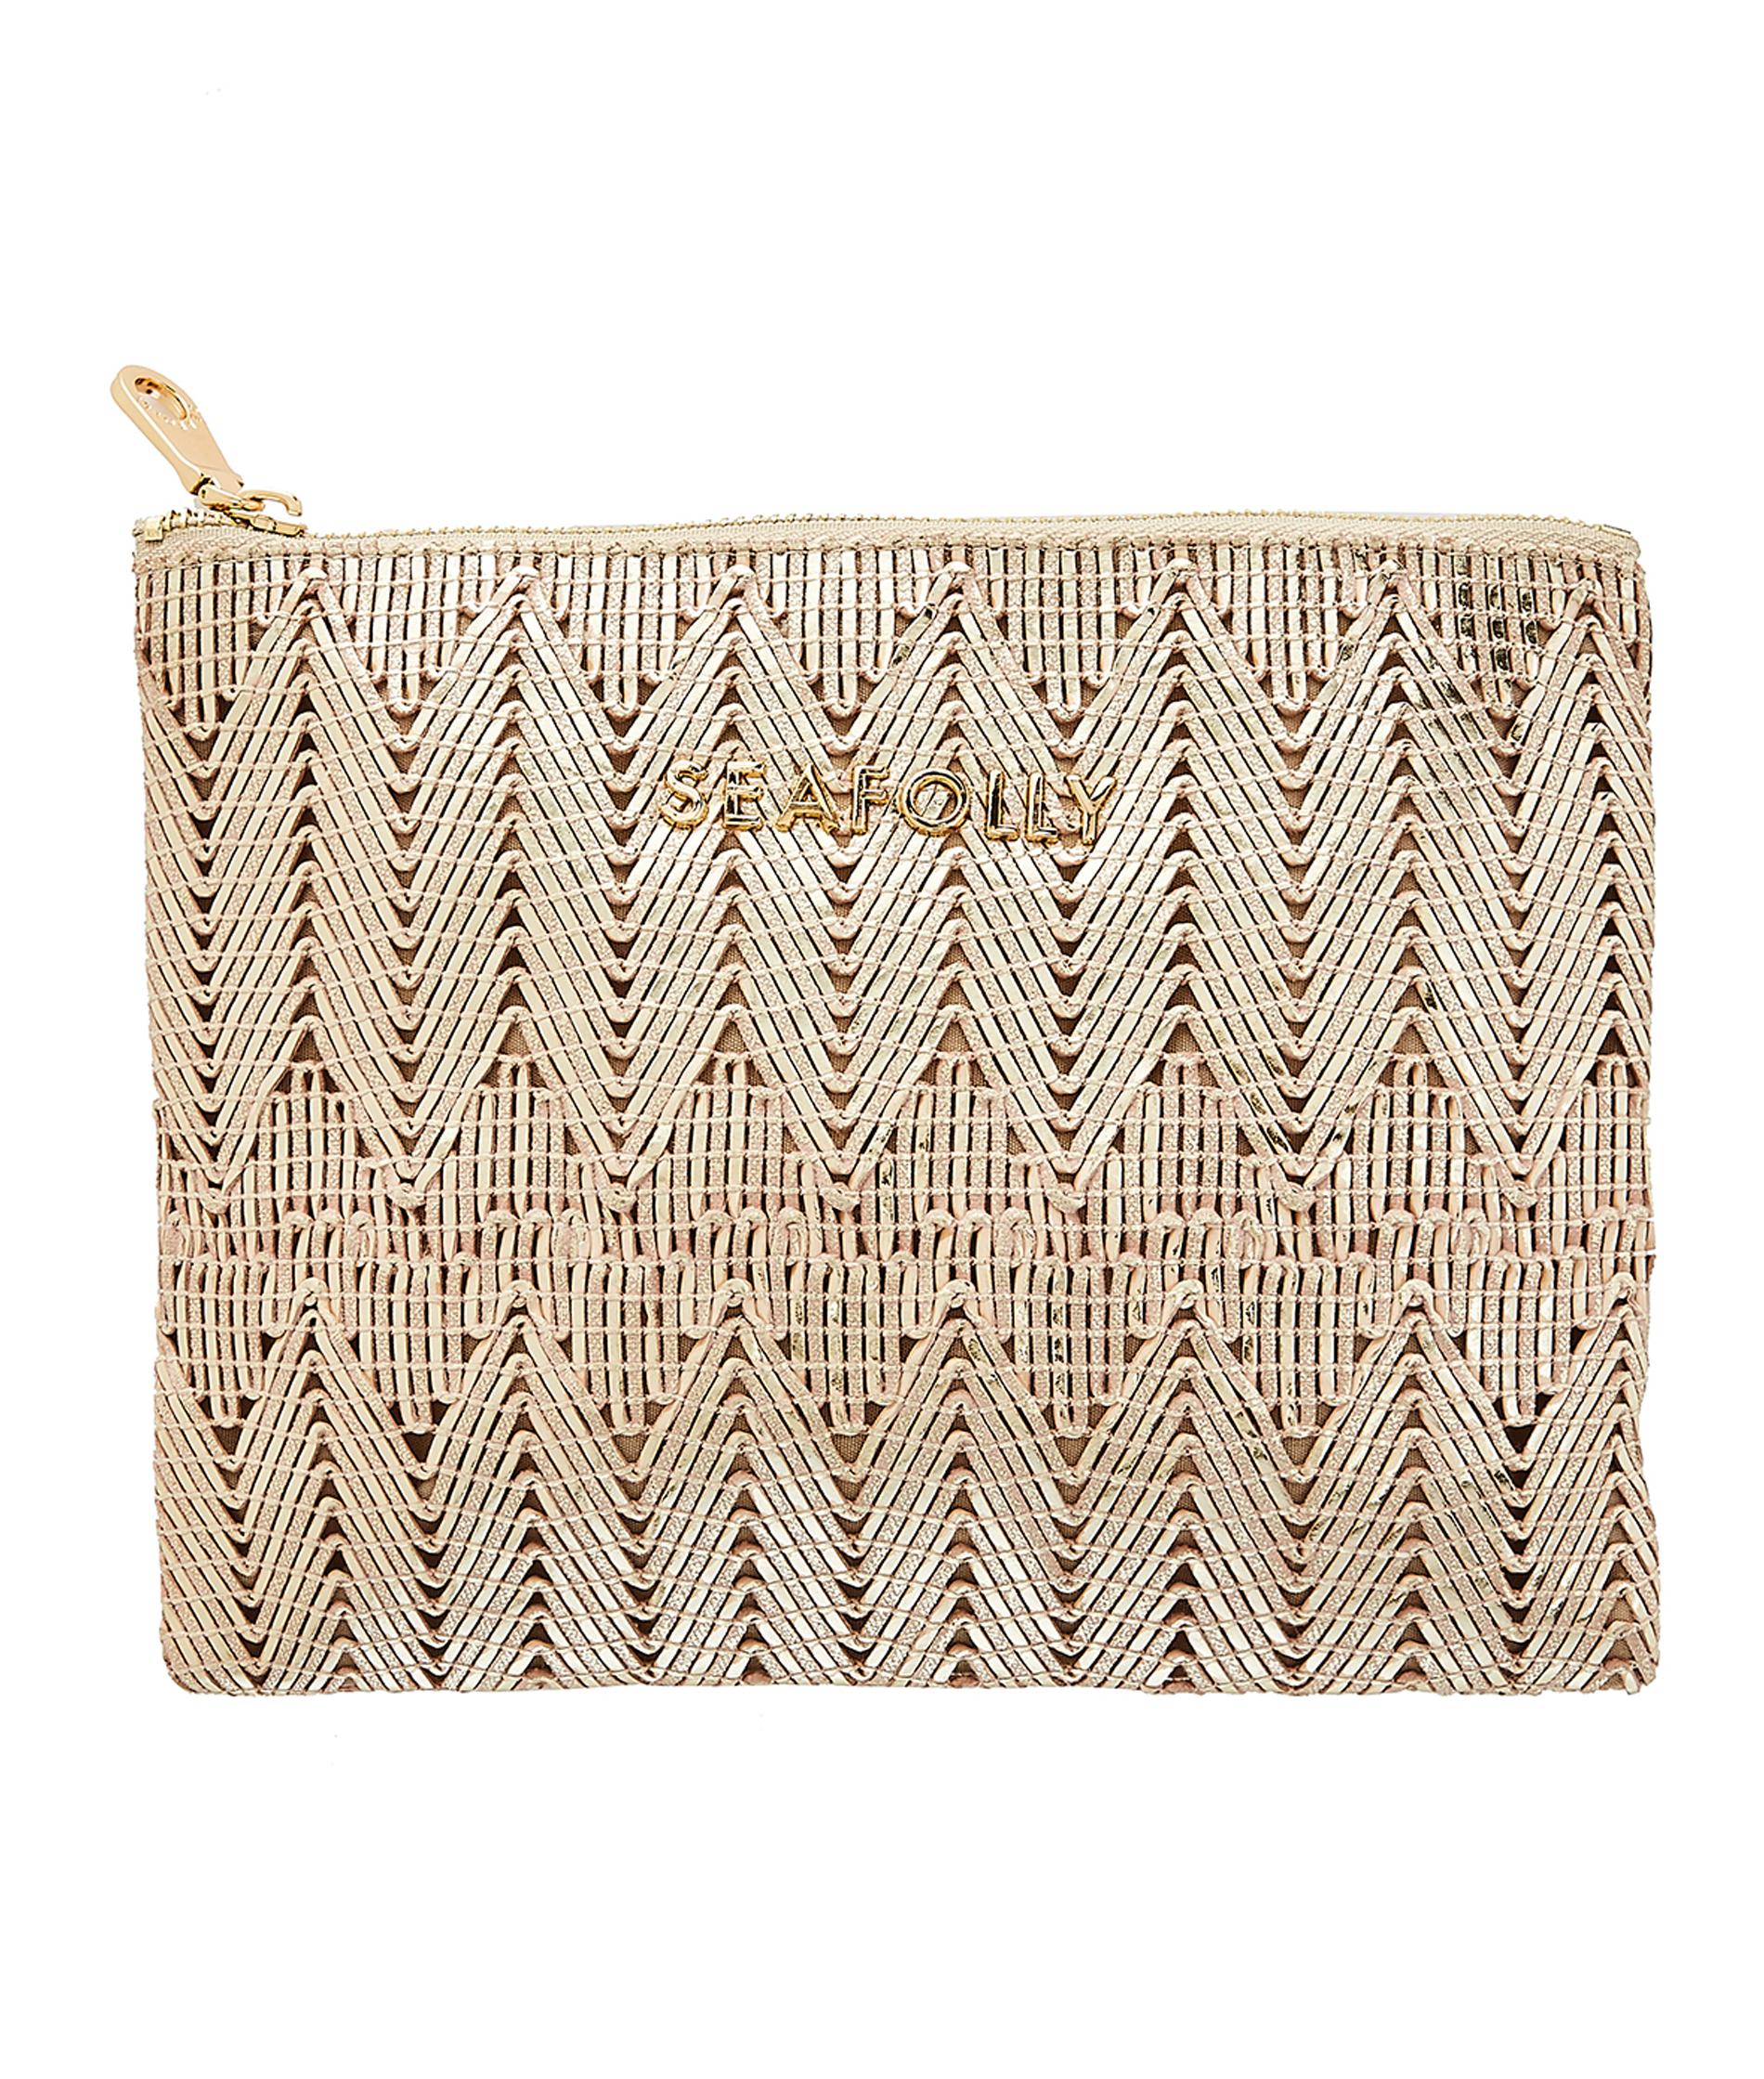 Seafolly Golden Clutch Bag - Gold